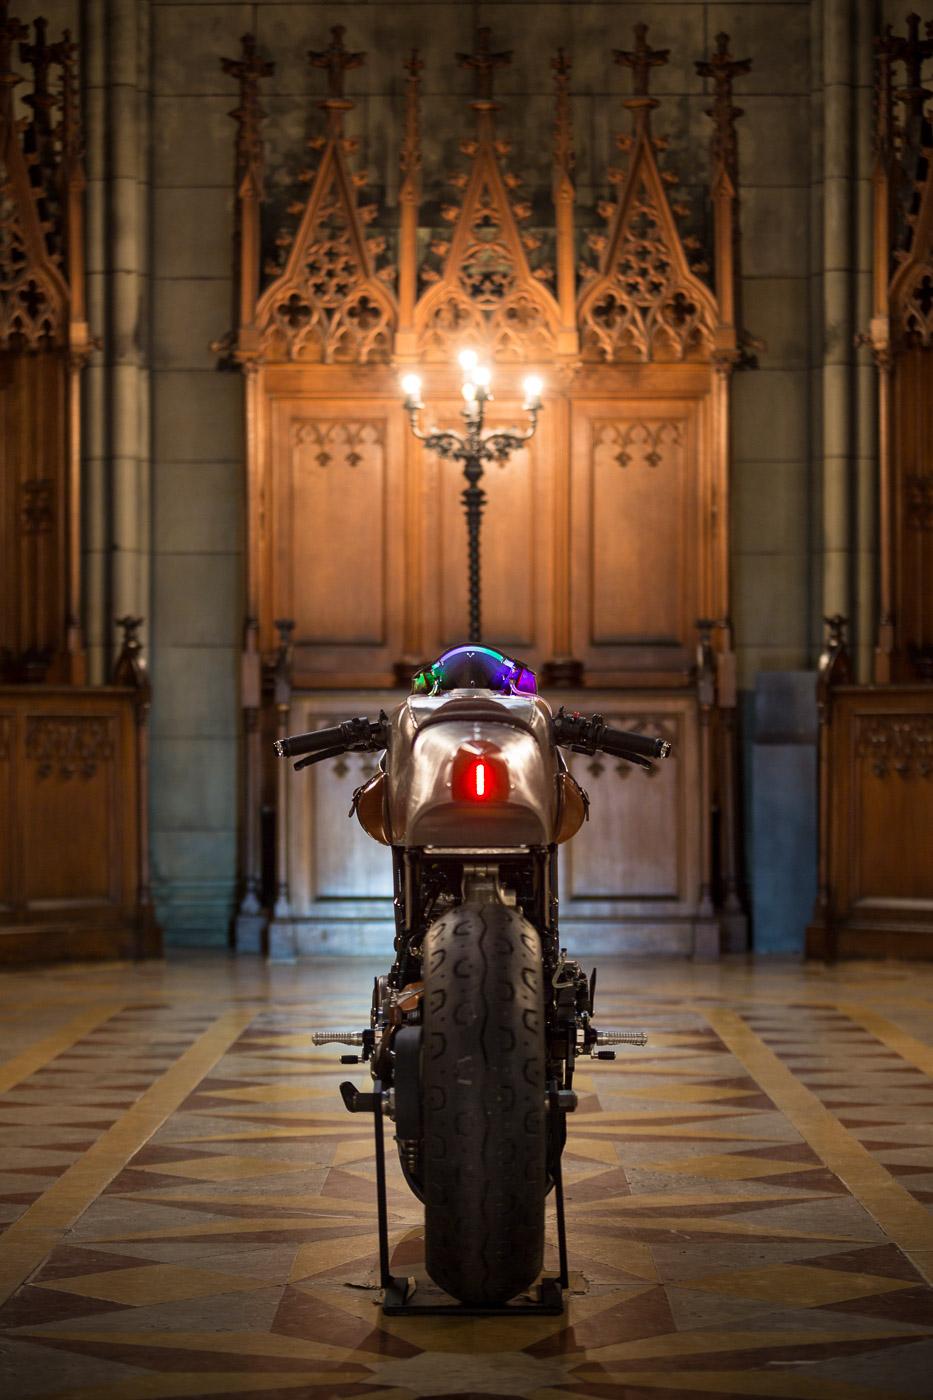 BU_Tresor_Bike (16 von 24)